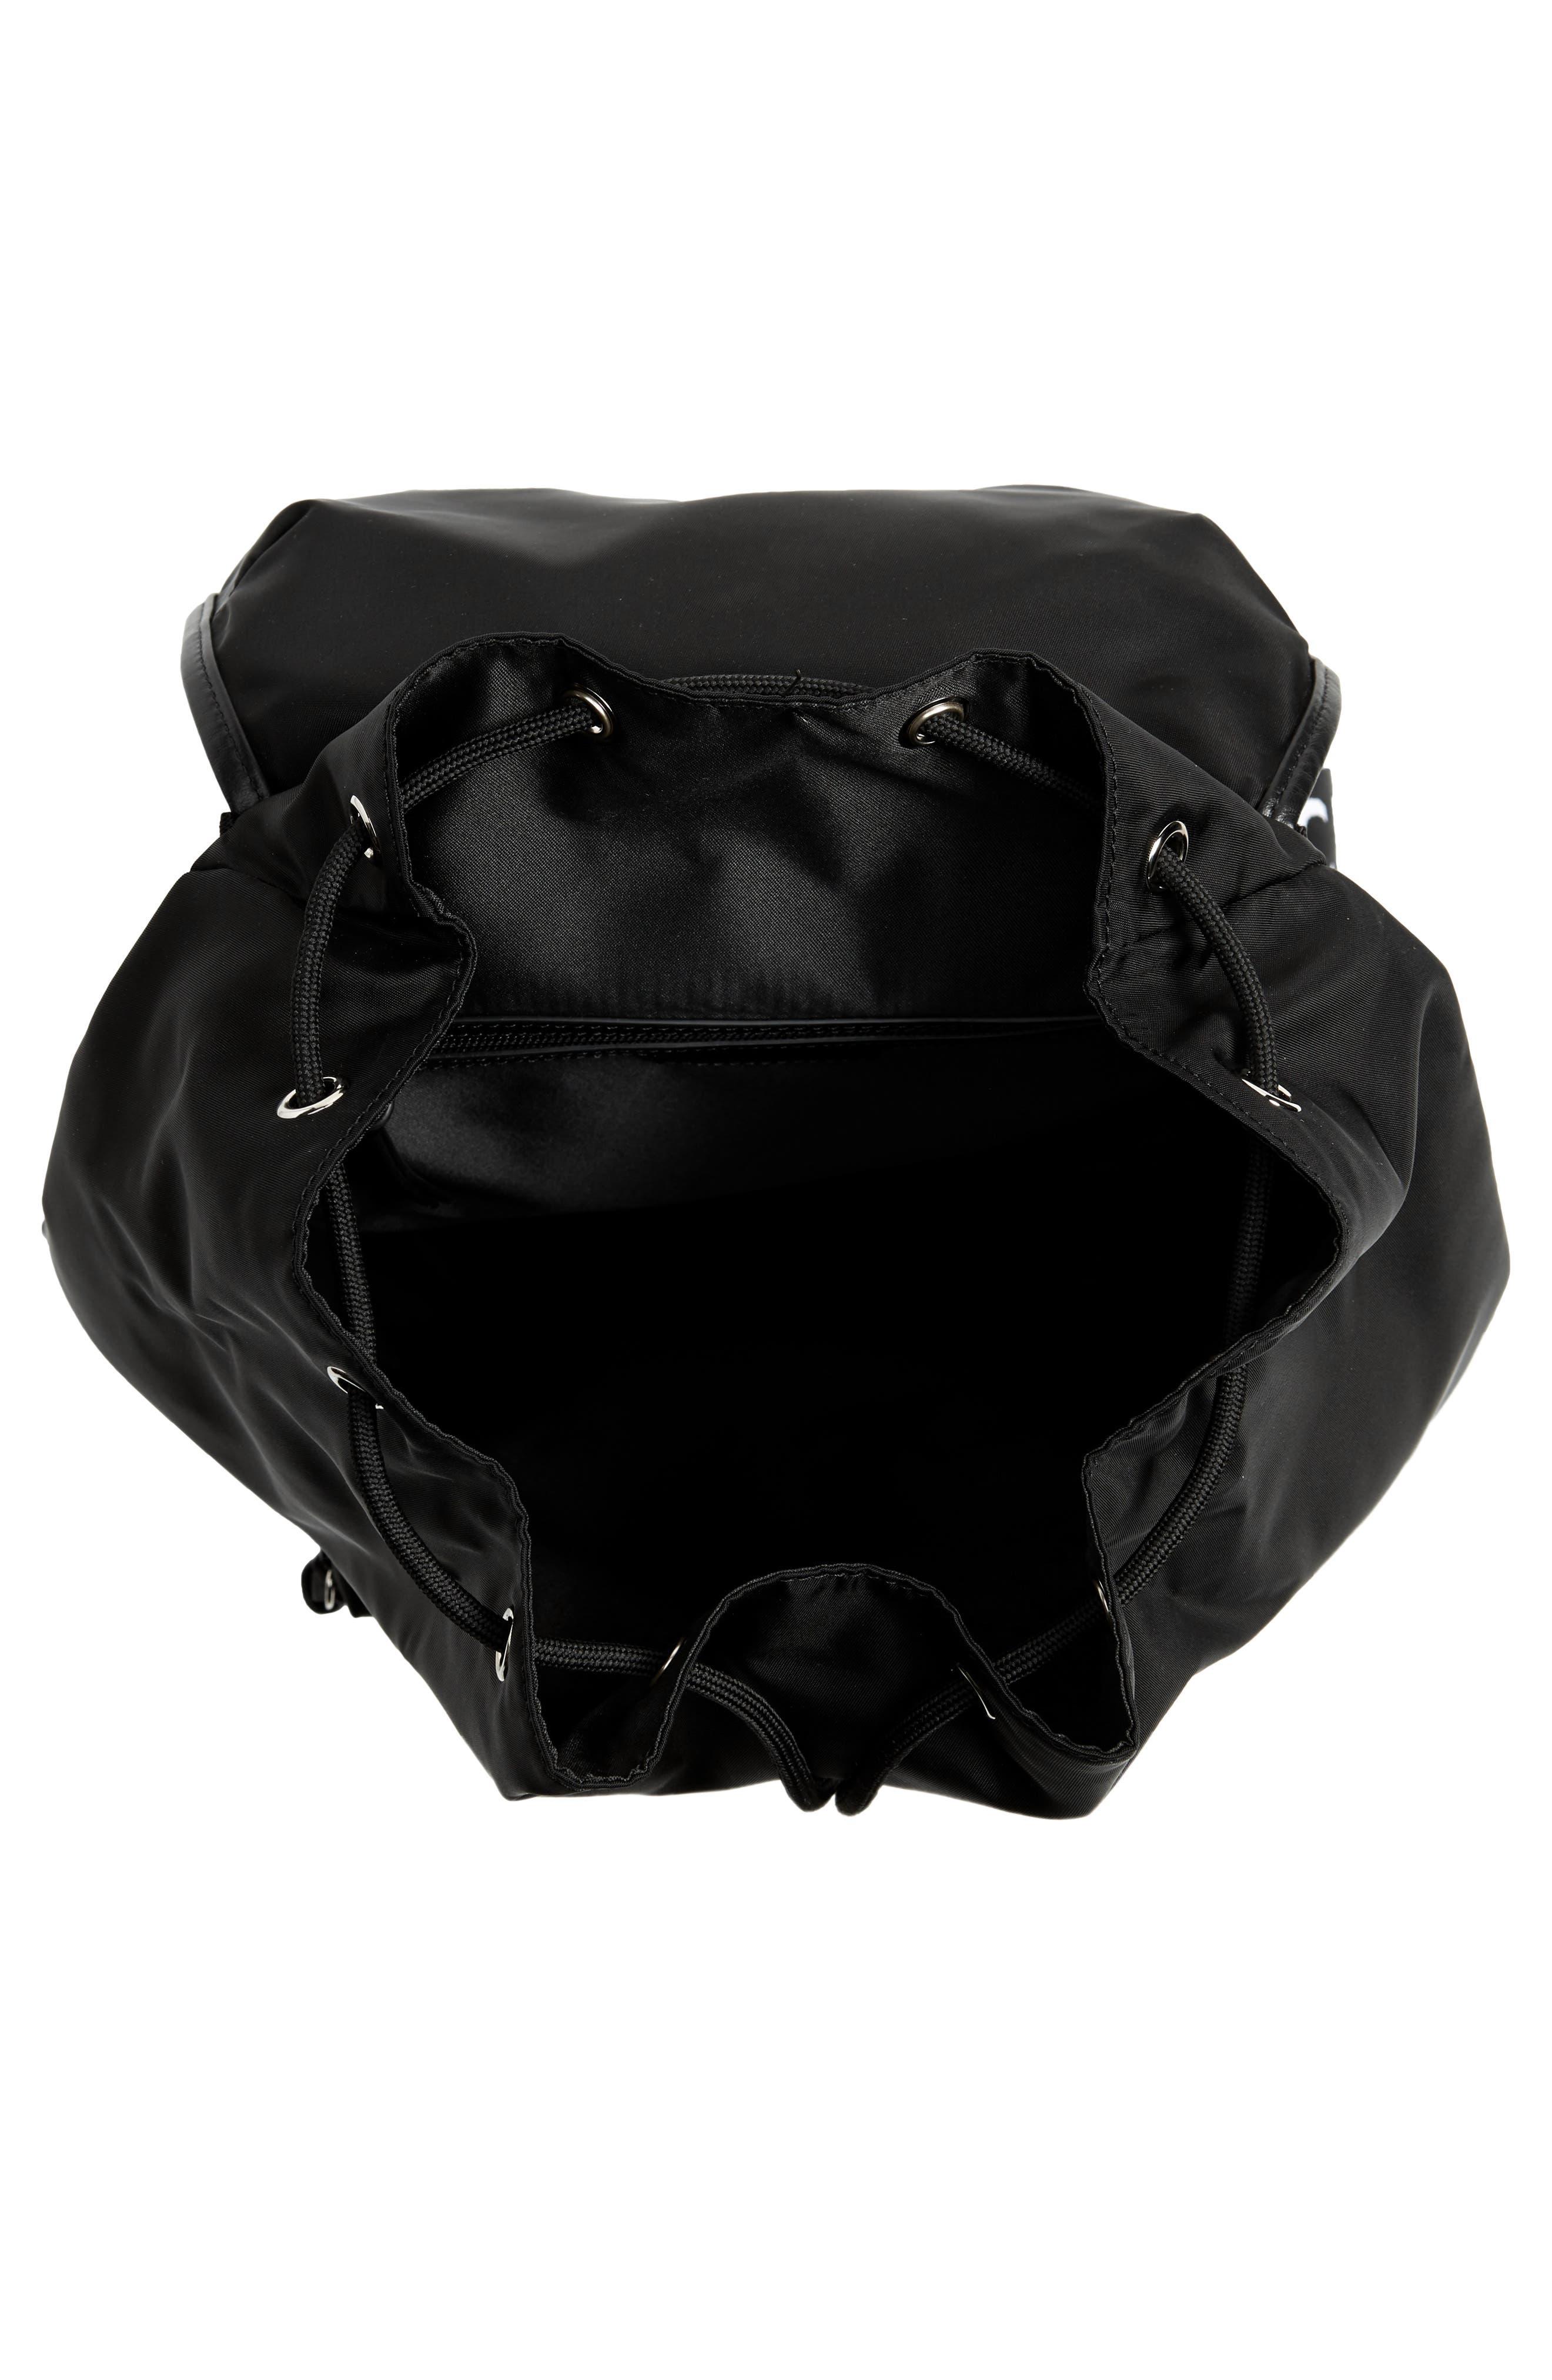 GIVENCHY, Light 3 Backpack, Alternate thumbnail 4, color, BLACK/ WHITE